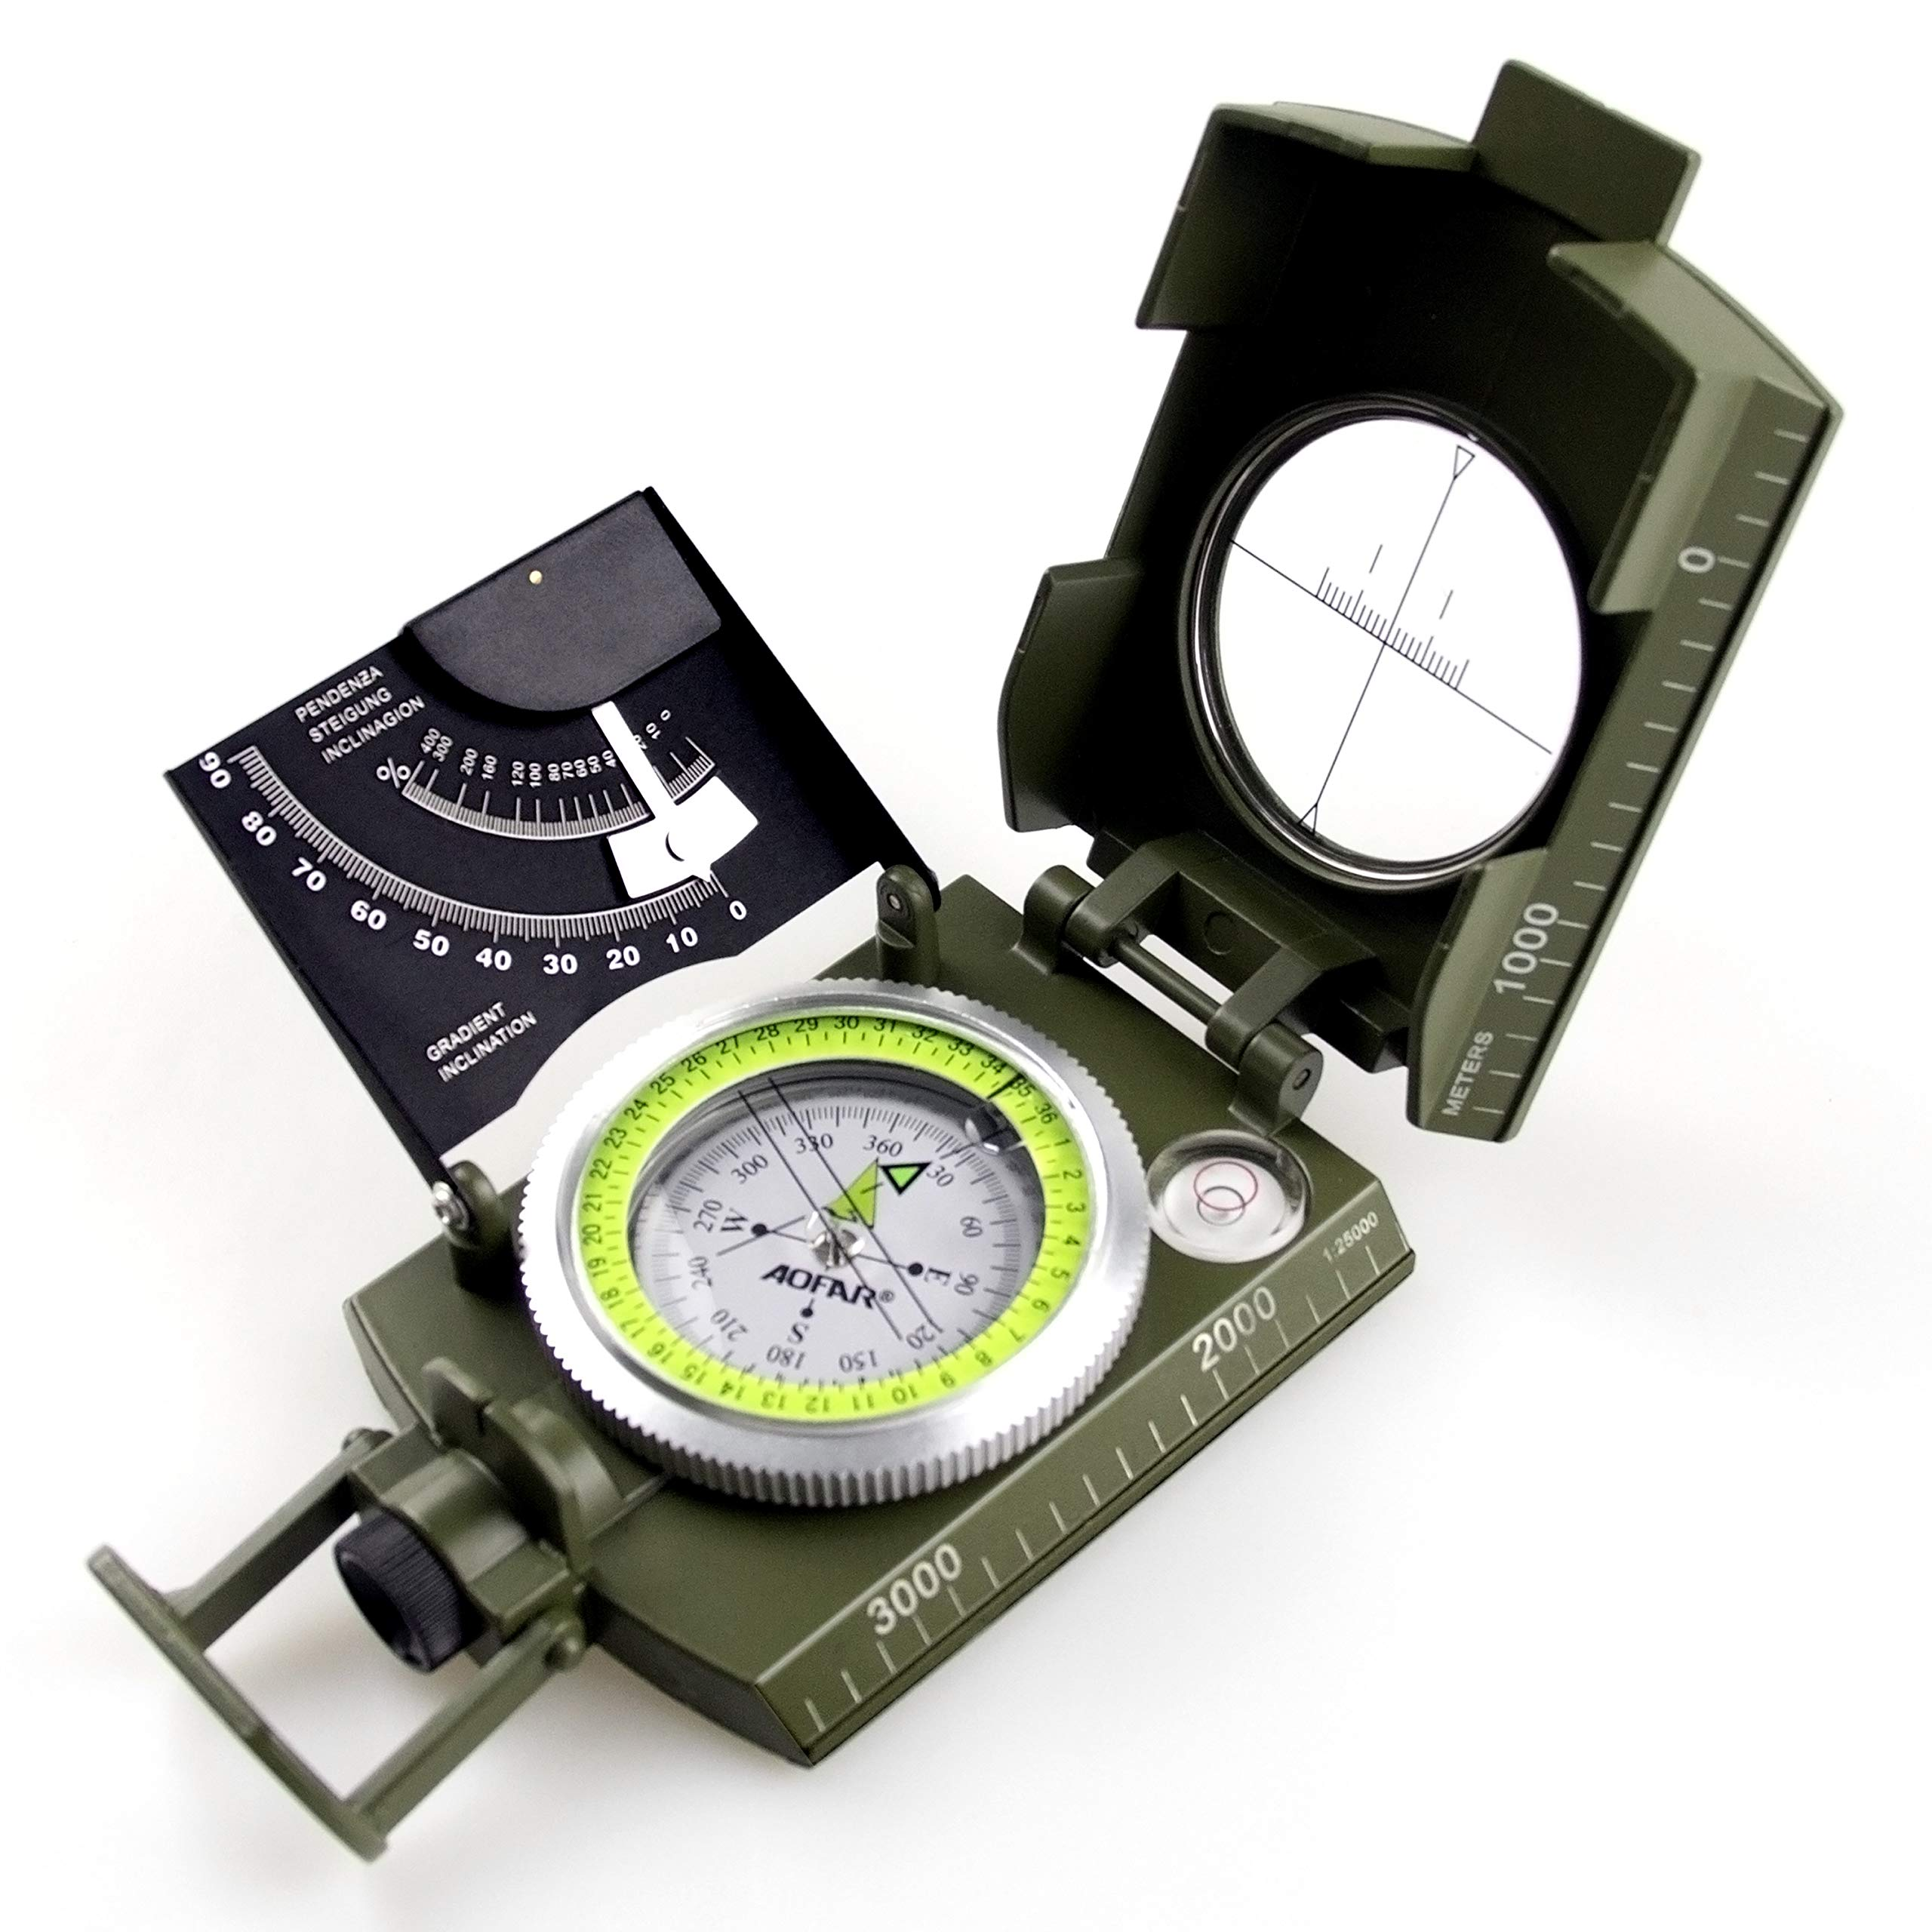 AOFAR Military Waterproof Inclinometer Activities